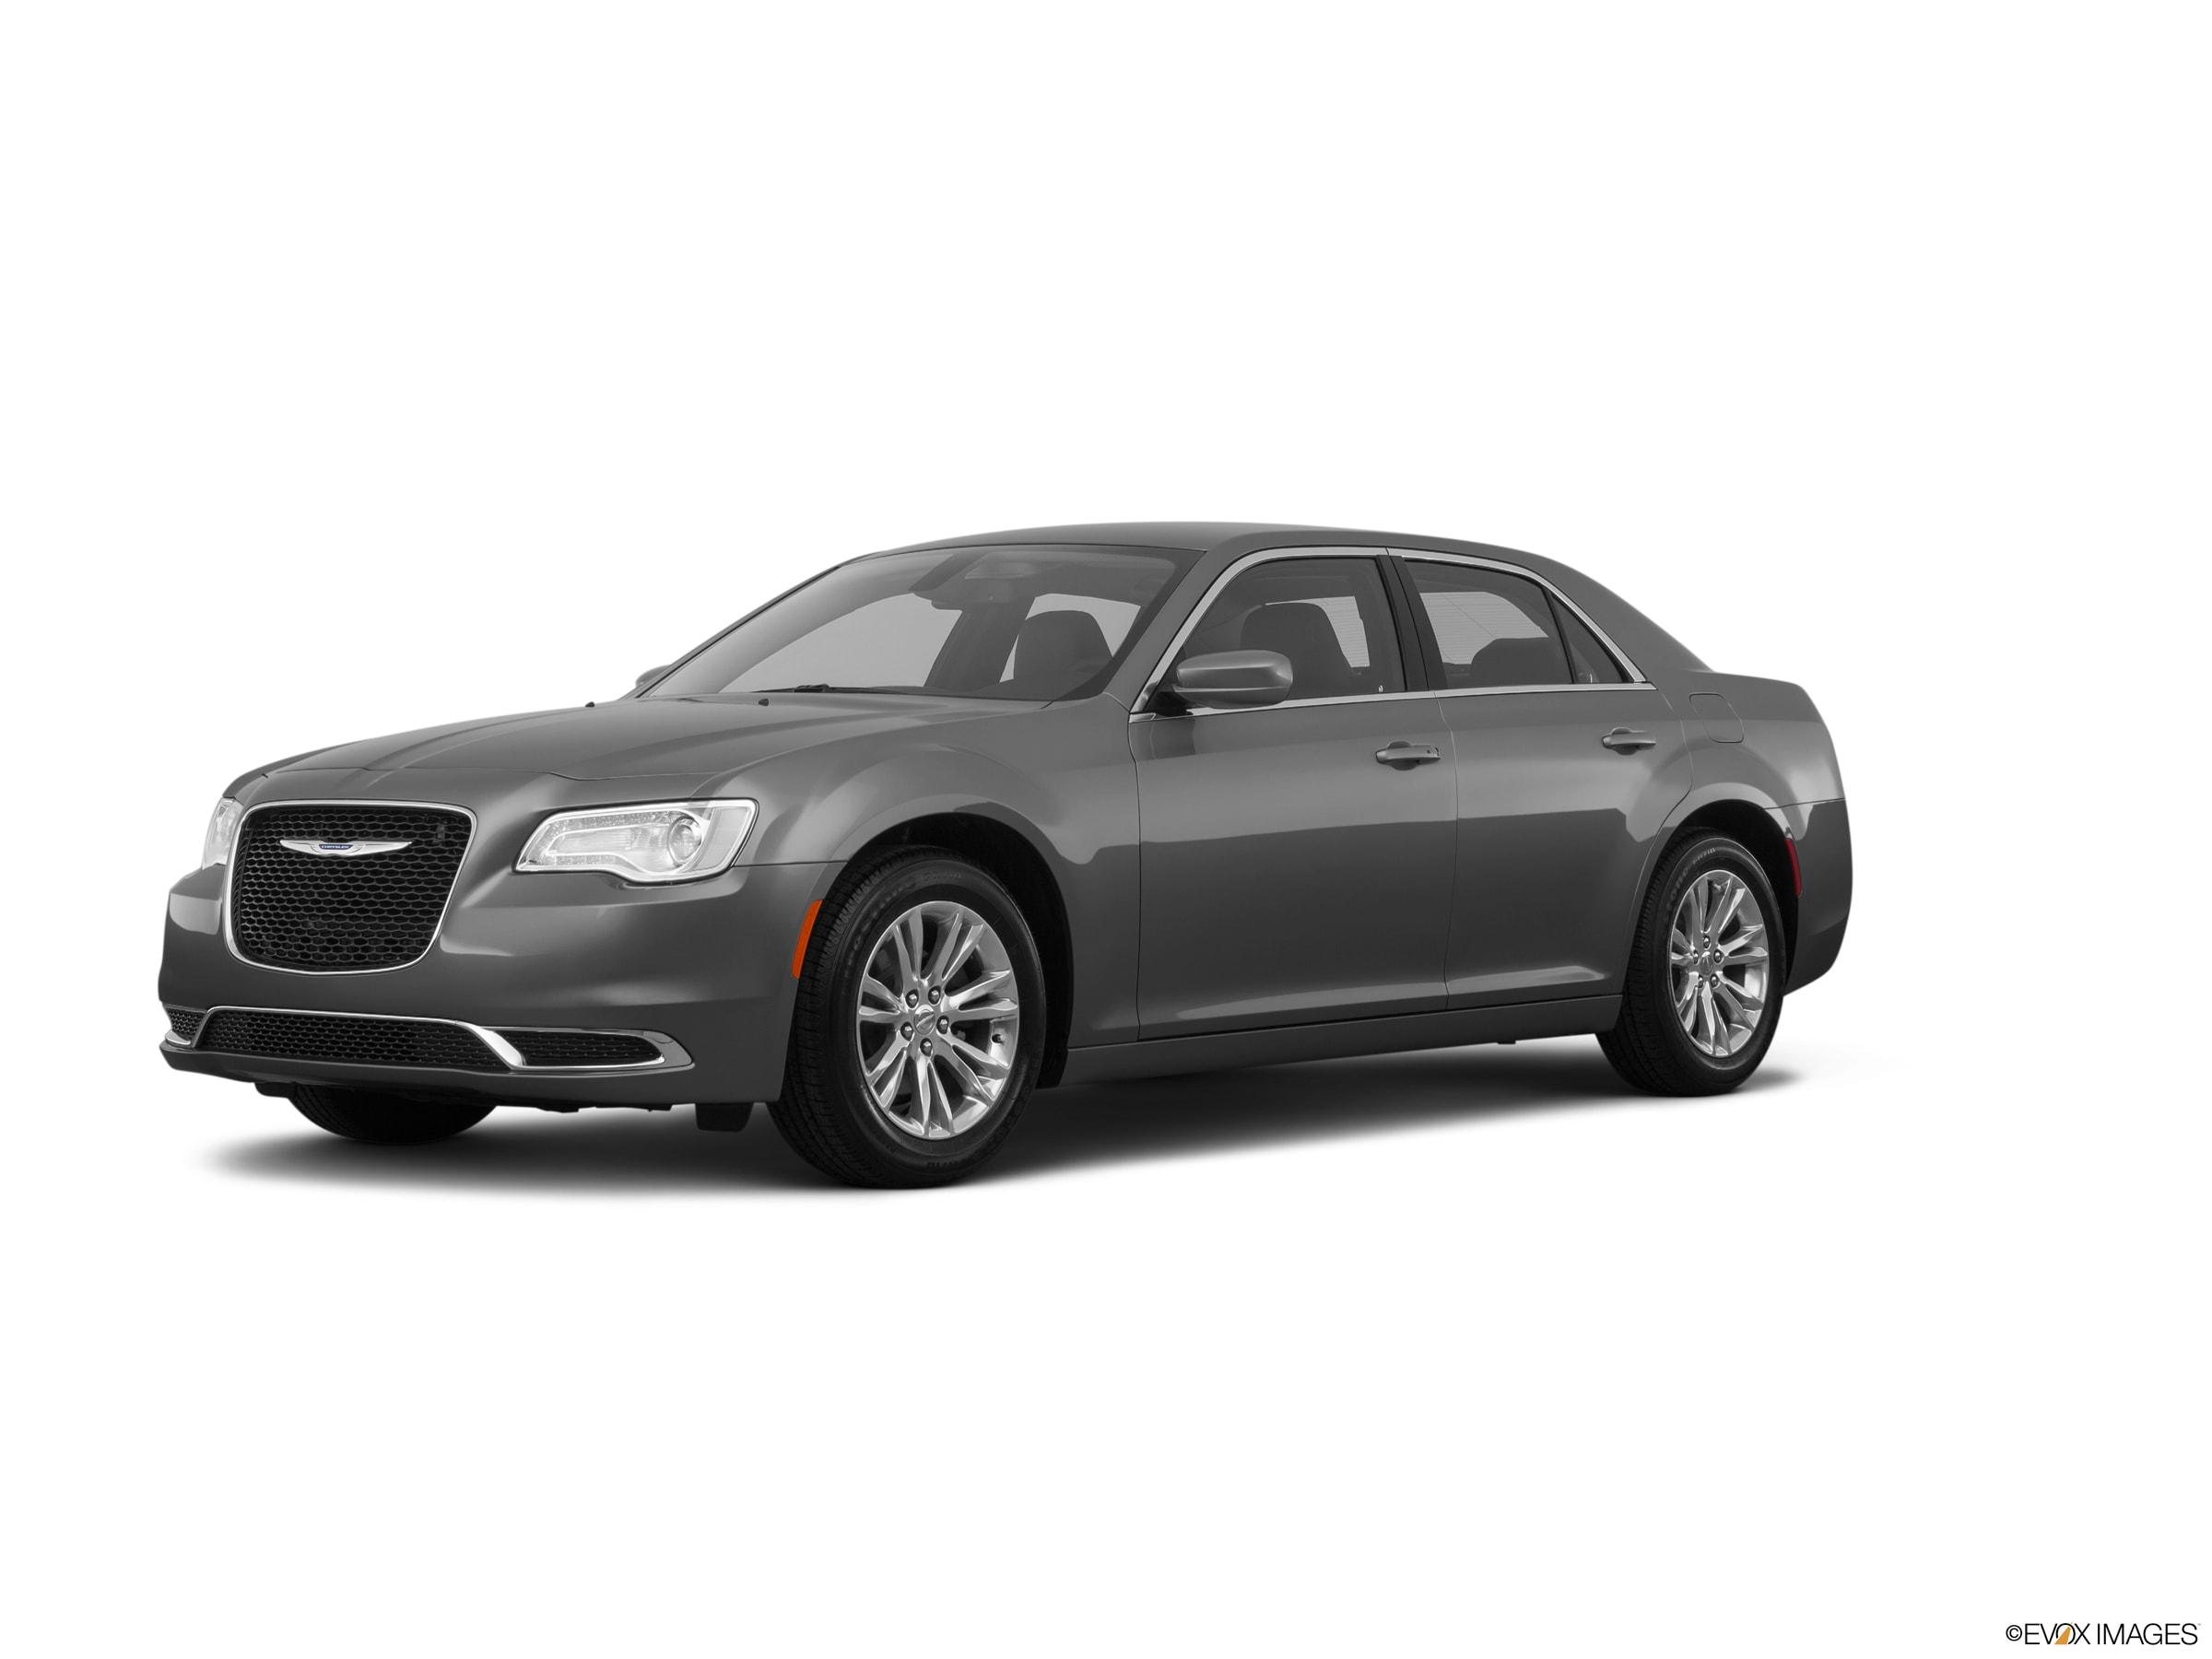 2017 Chrysler 300 Car